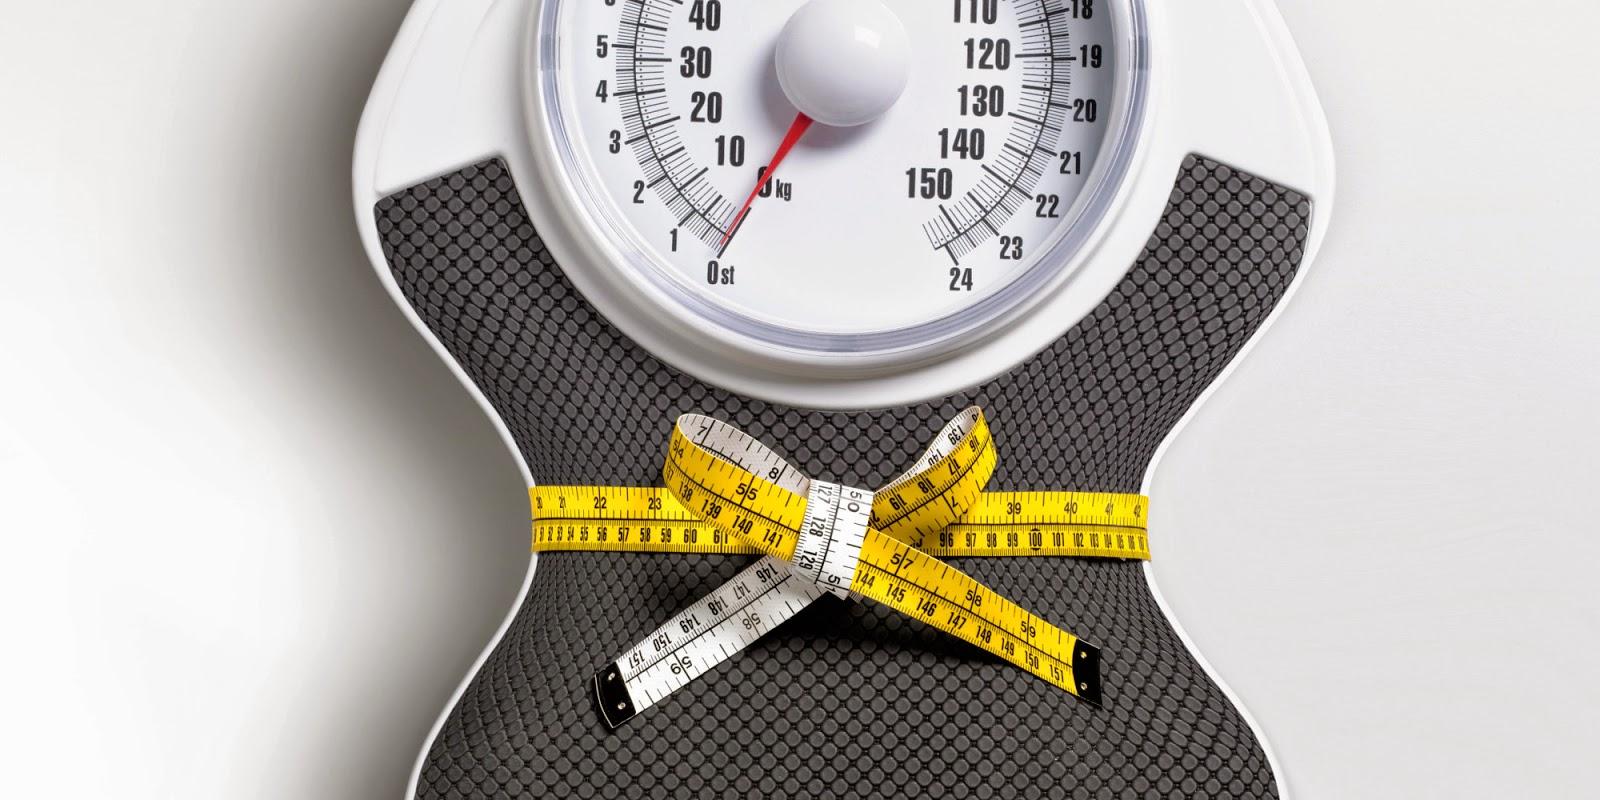 Healthy diet, santa cruz vp free weight loss more rapid transit